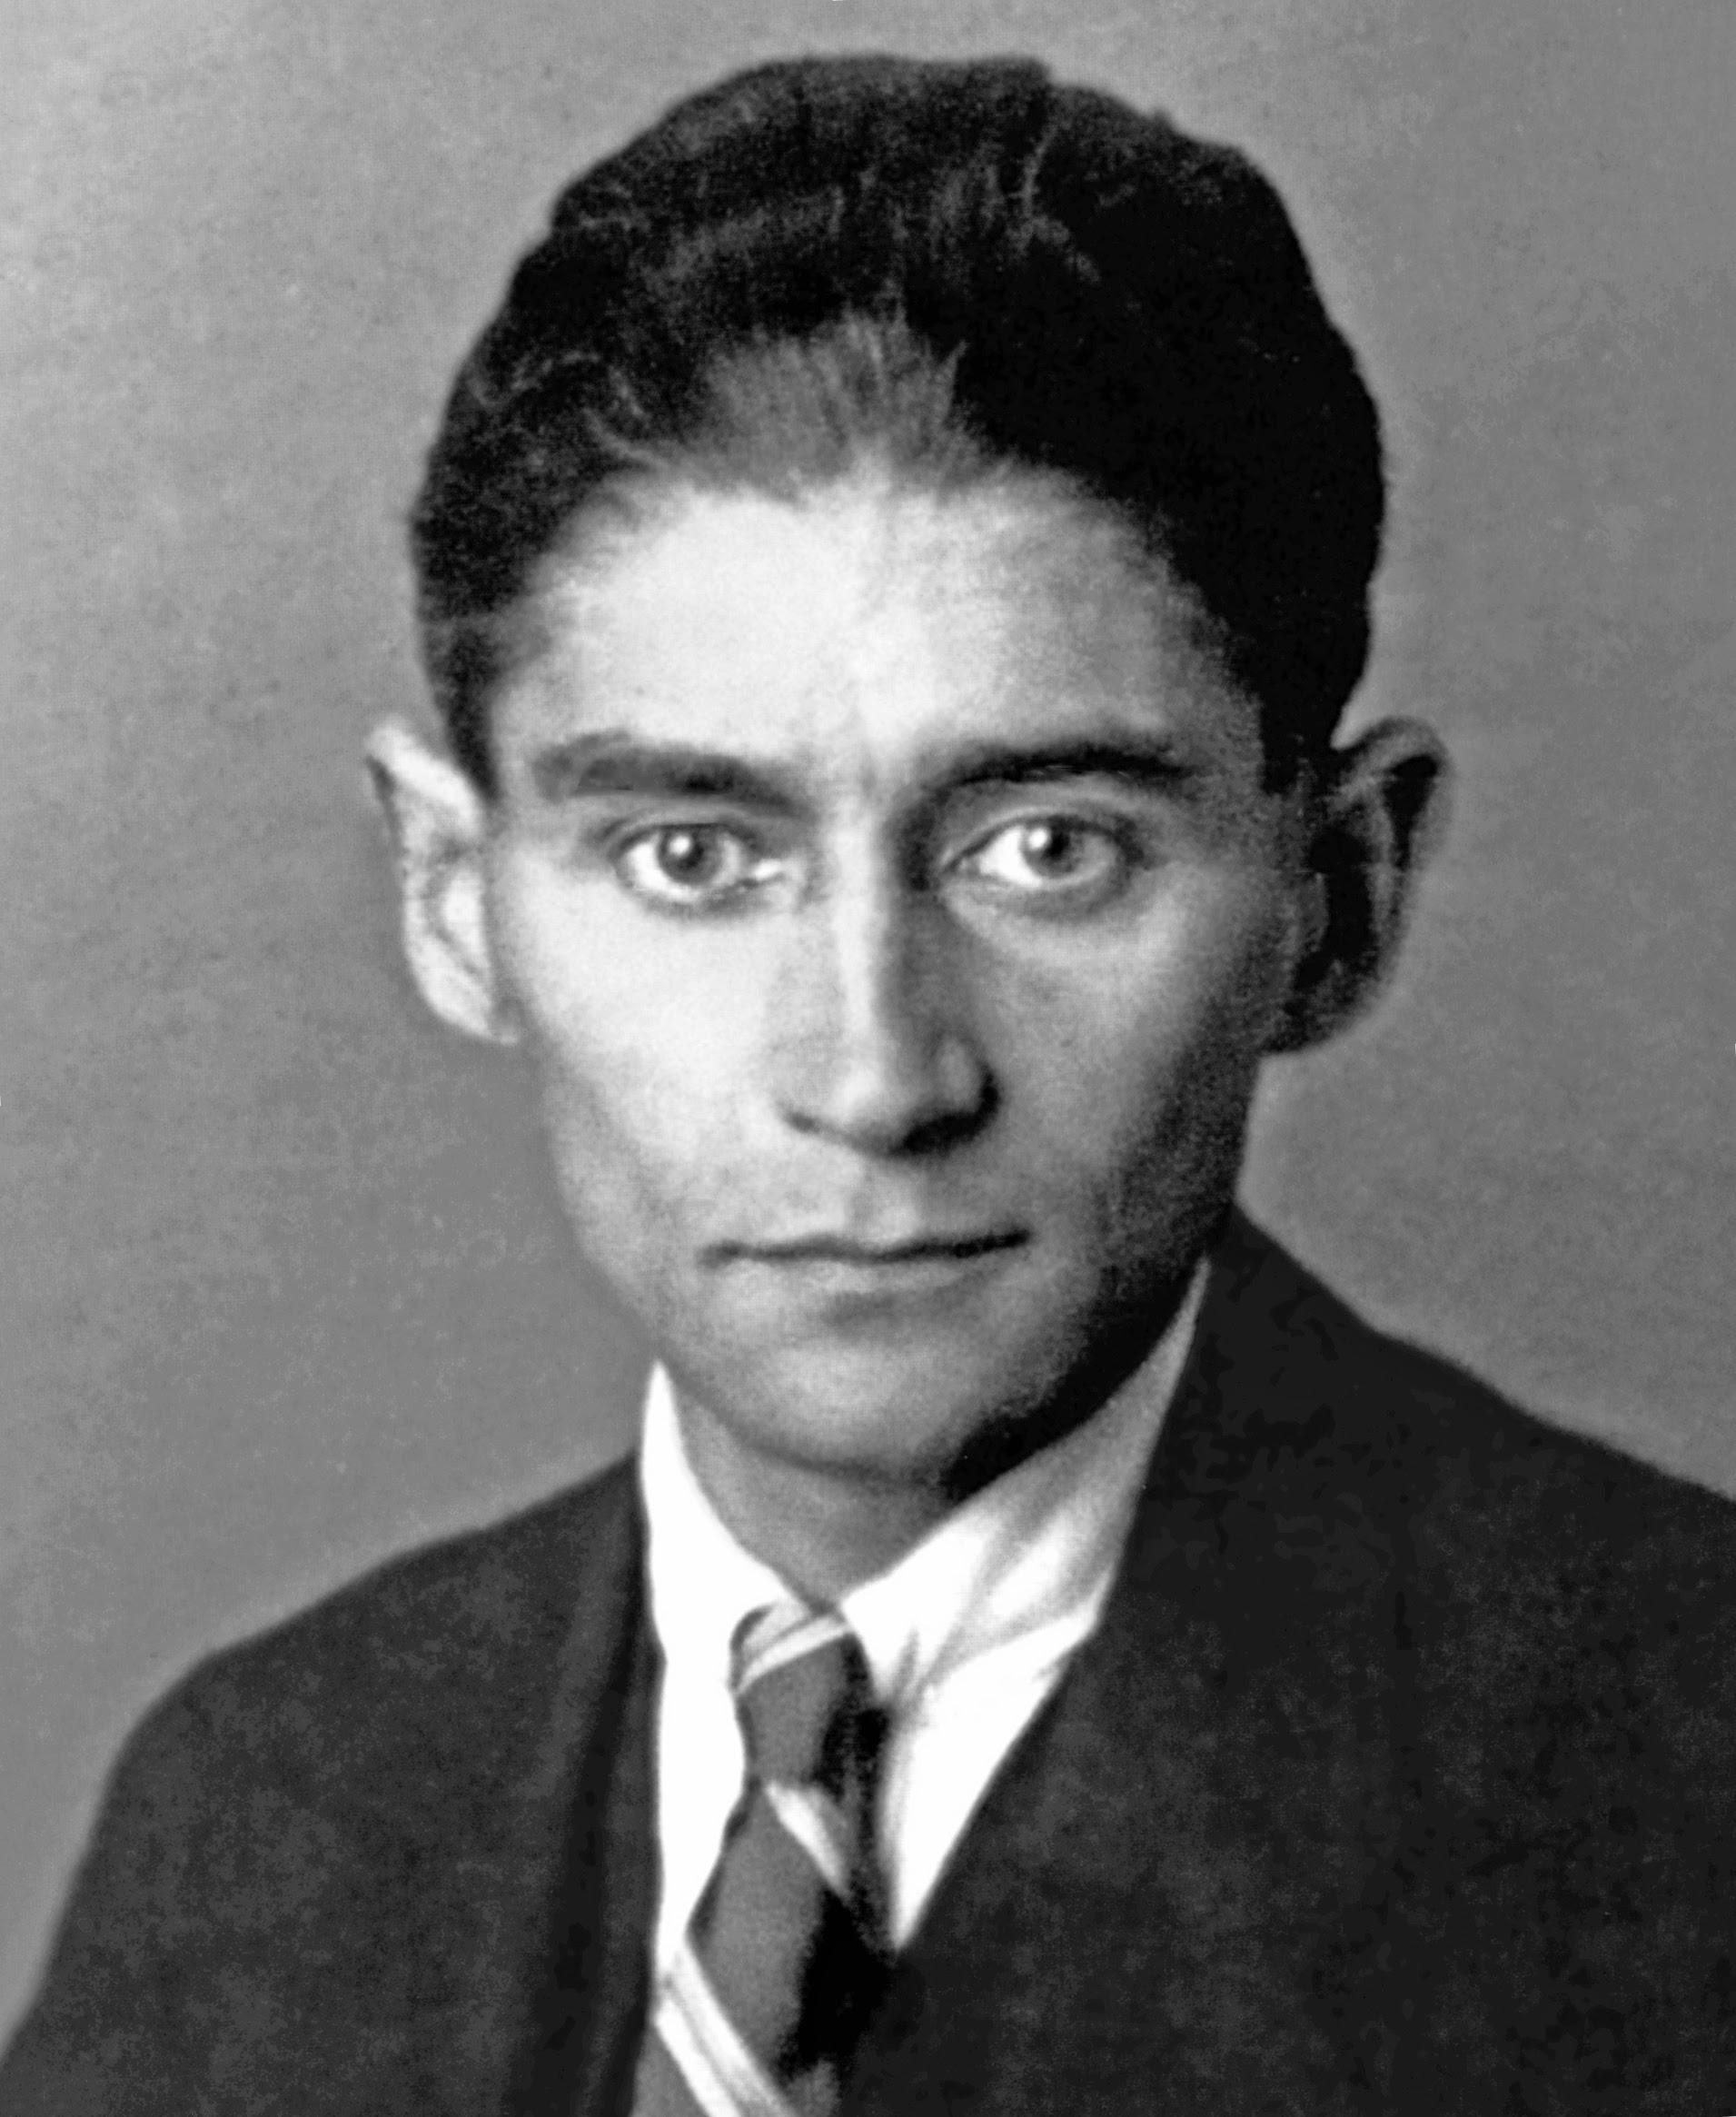 File:Kafka.jpg